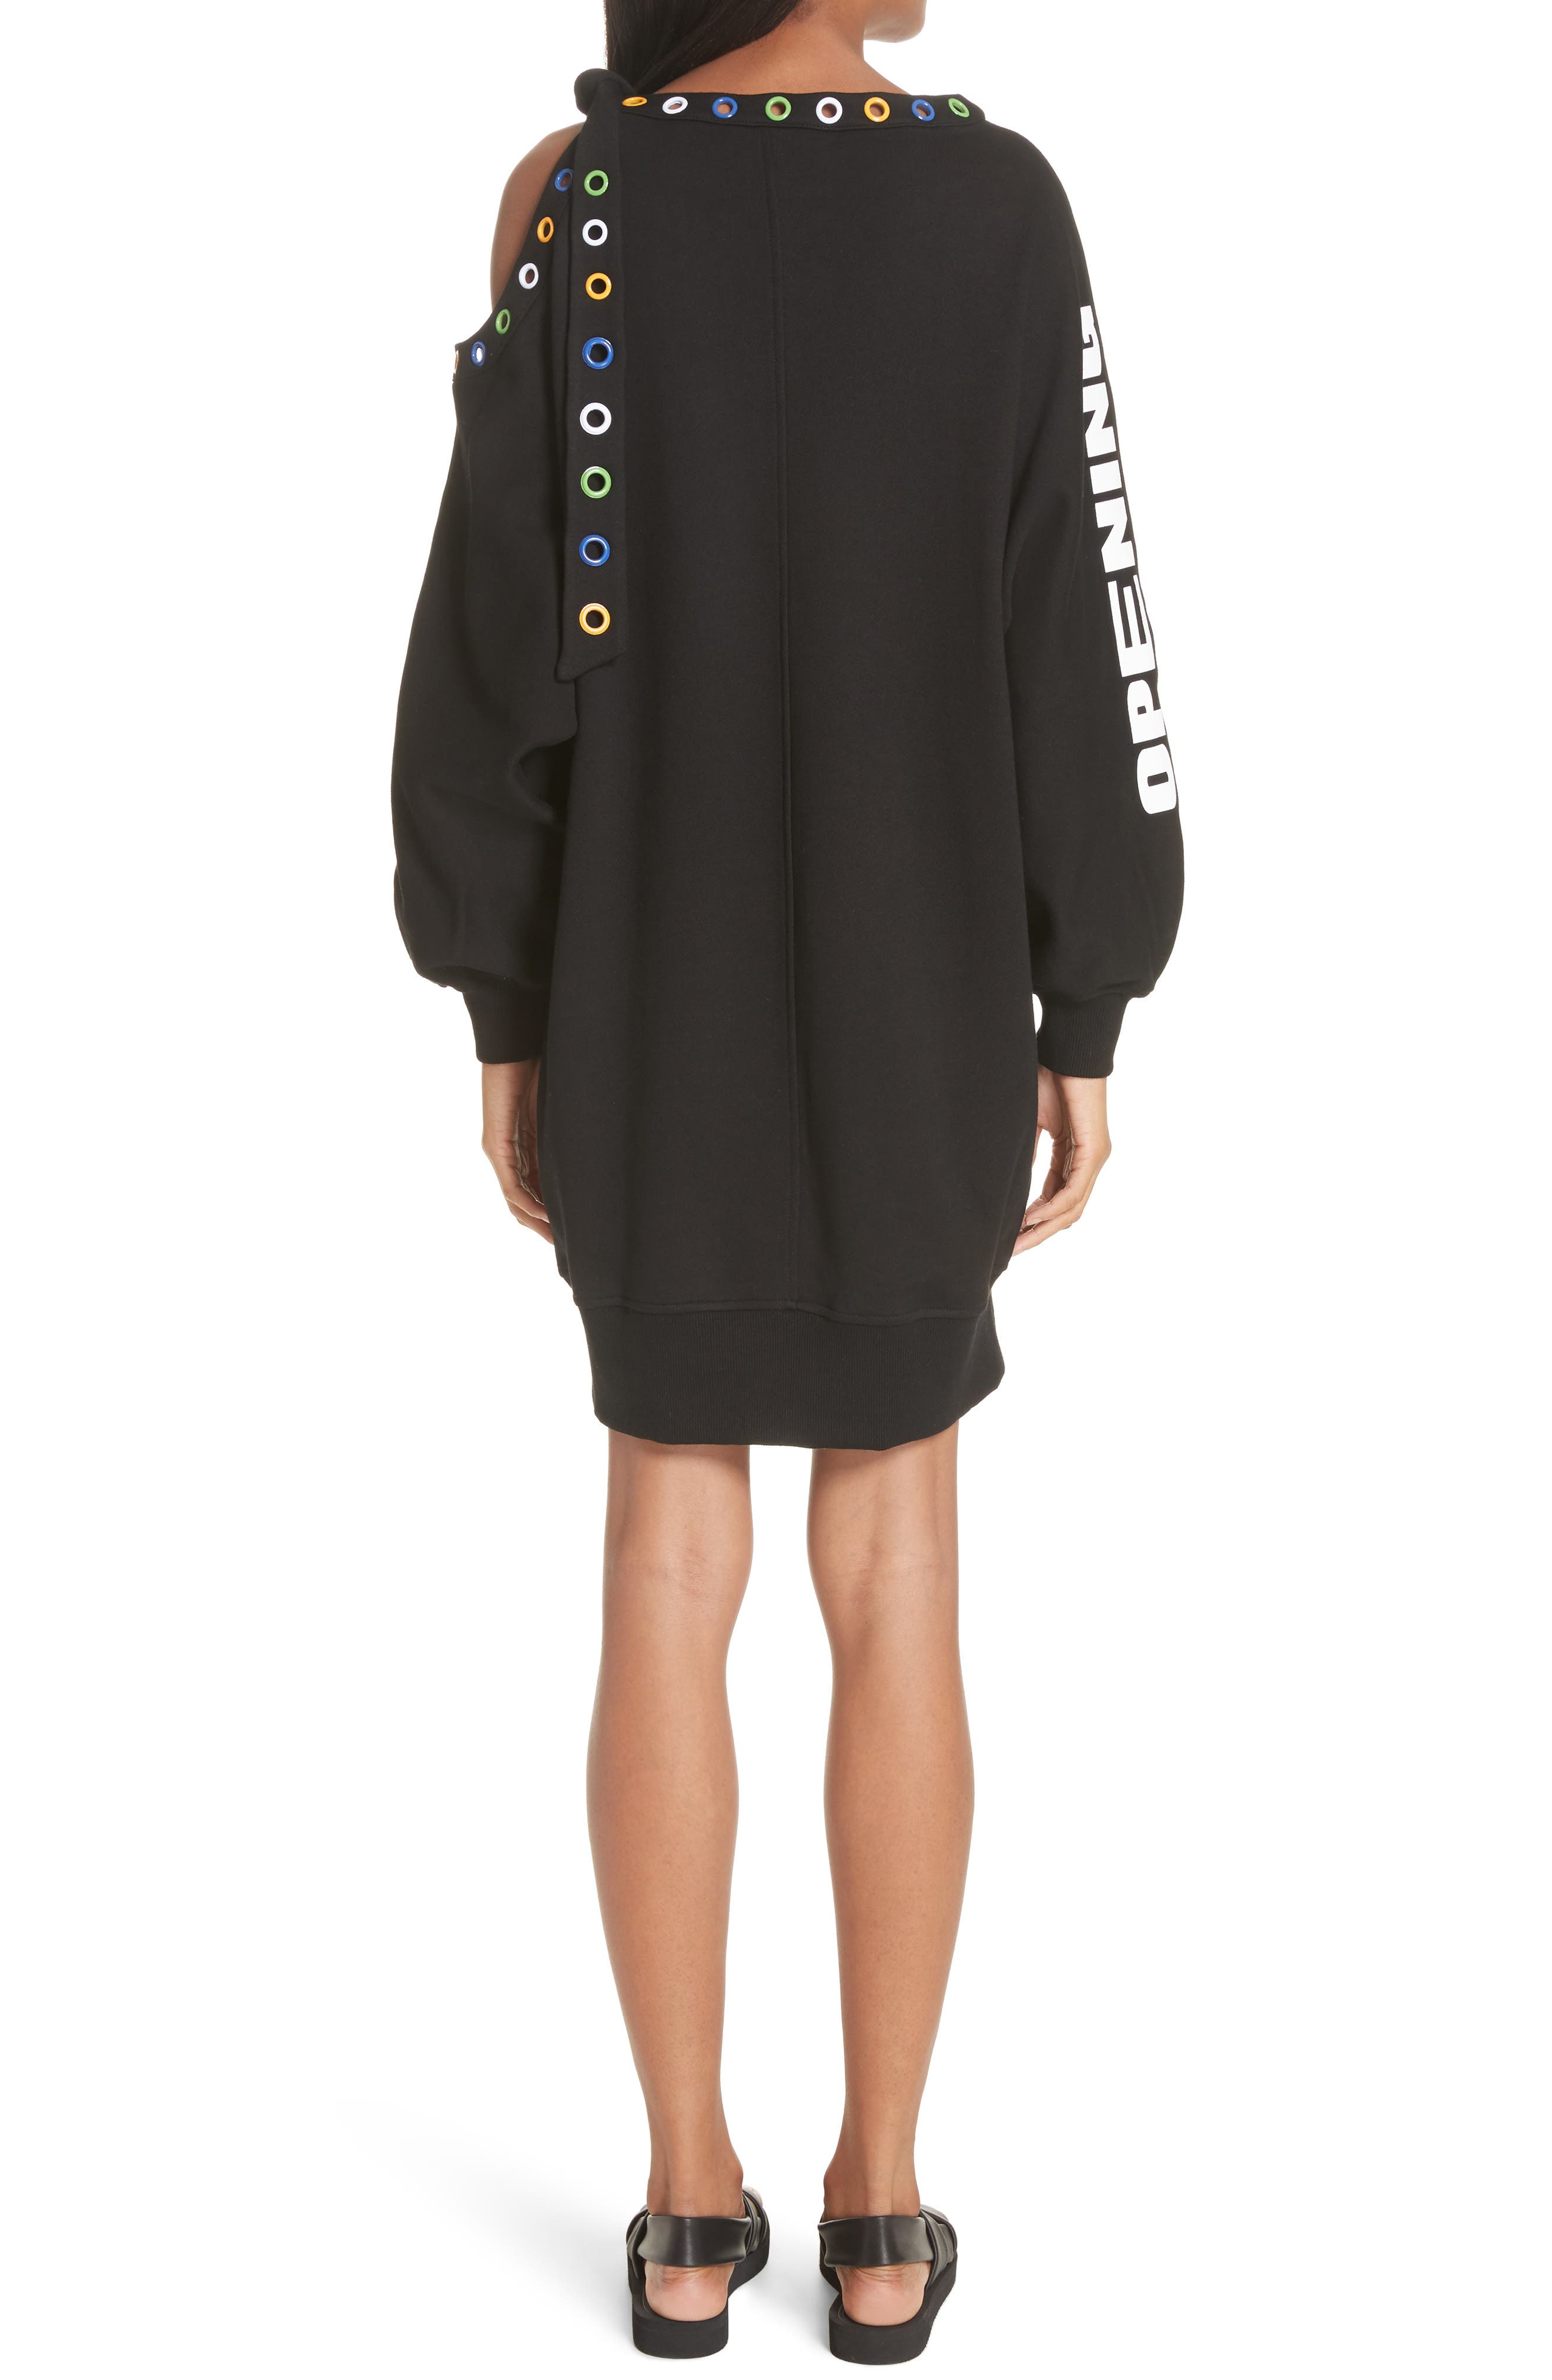 Christian Riese Lassen Sweatshirt Dress,                             Alternate thumbnail 2, color,                             Black